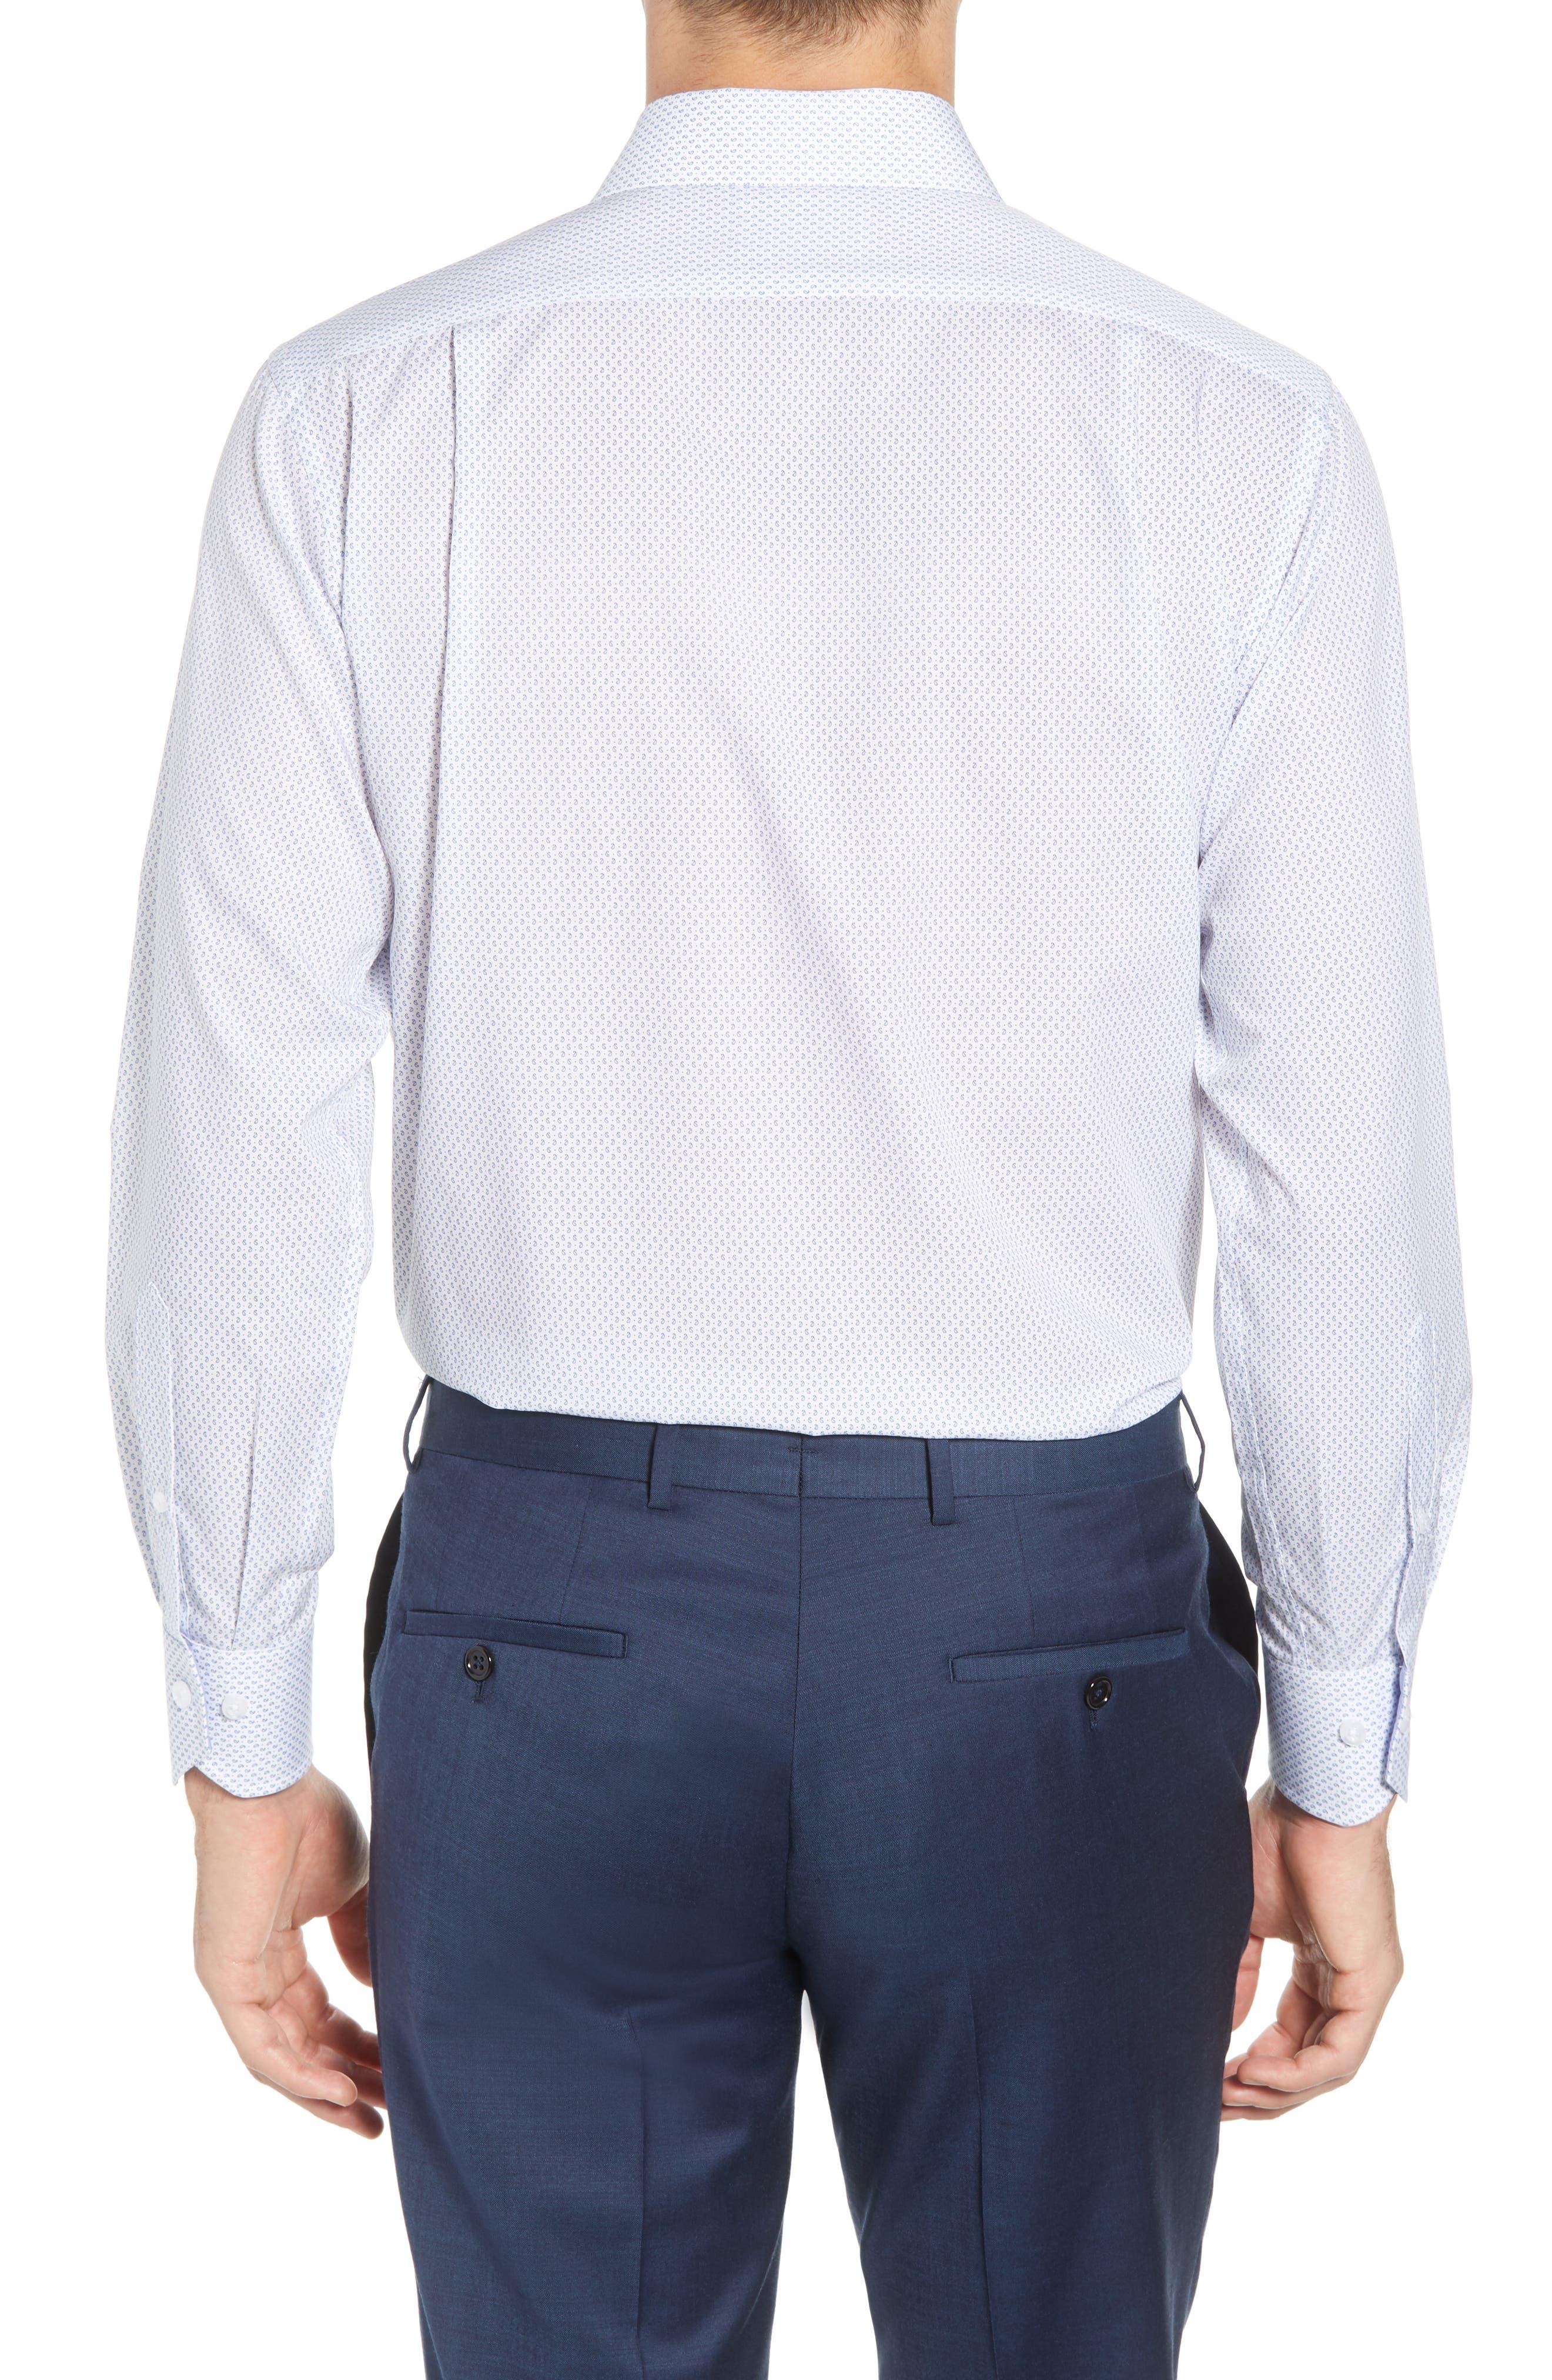 Trim Fit Paisley Dress Shirt,                             Alternate thumbnail 3, color,                             White/ Blue